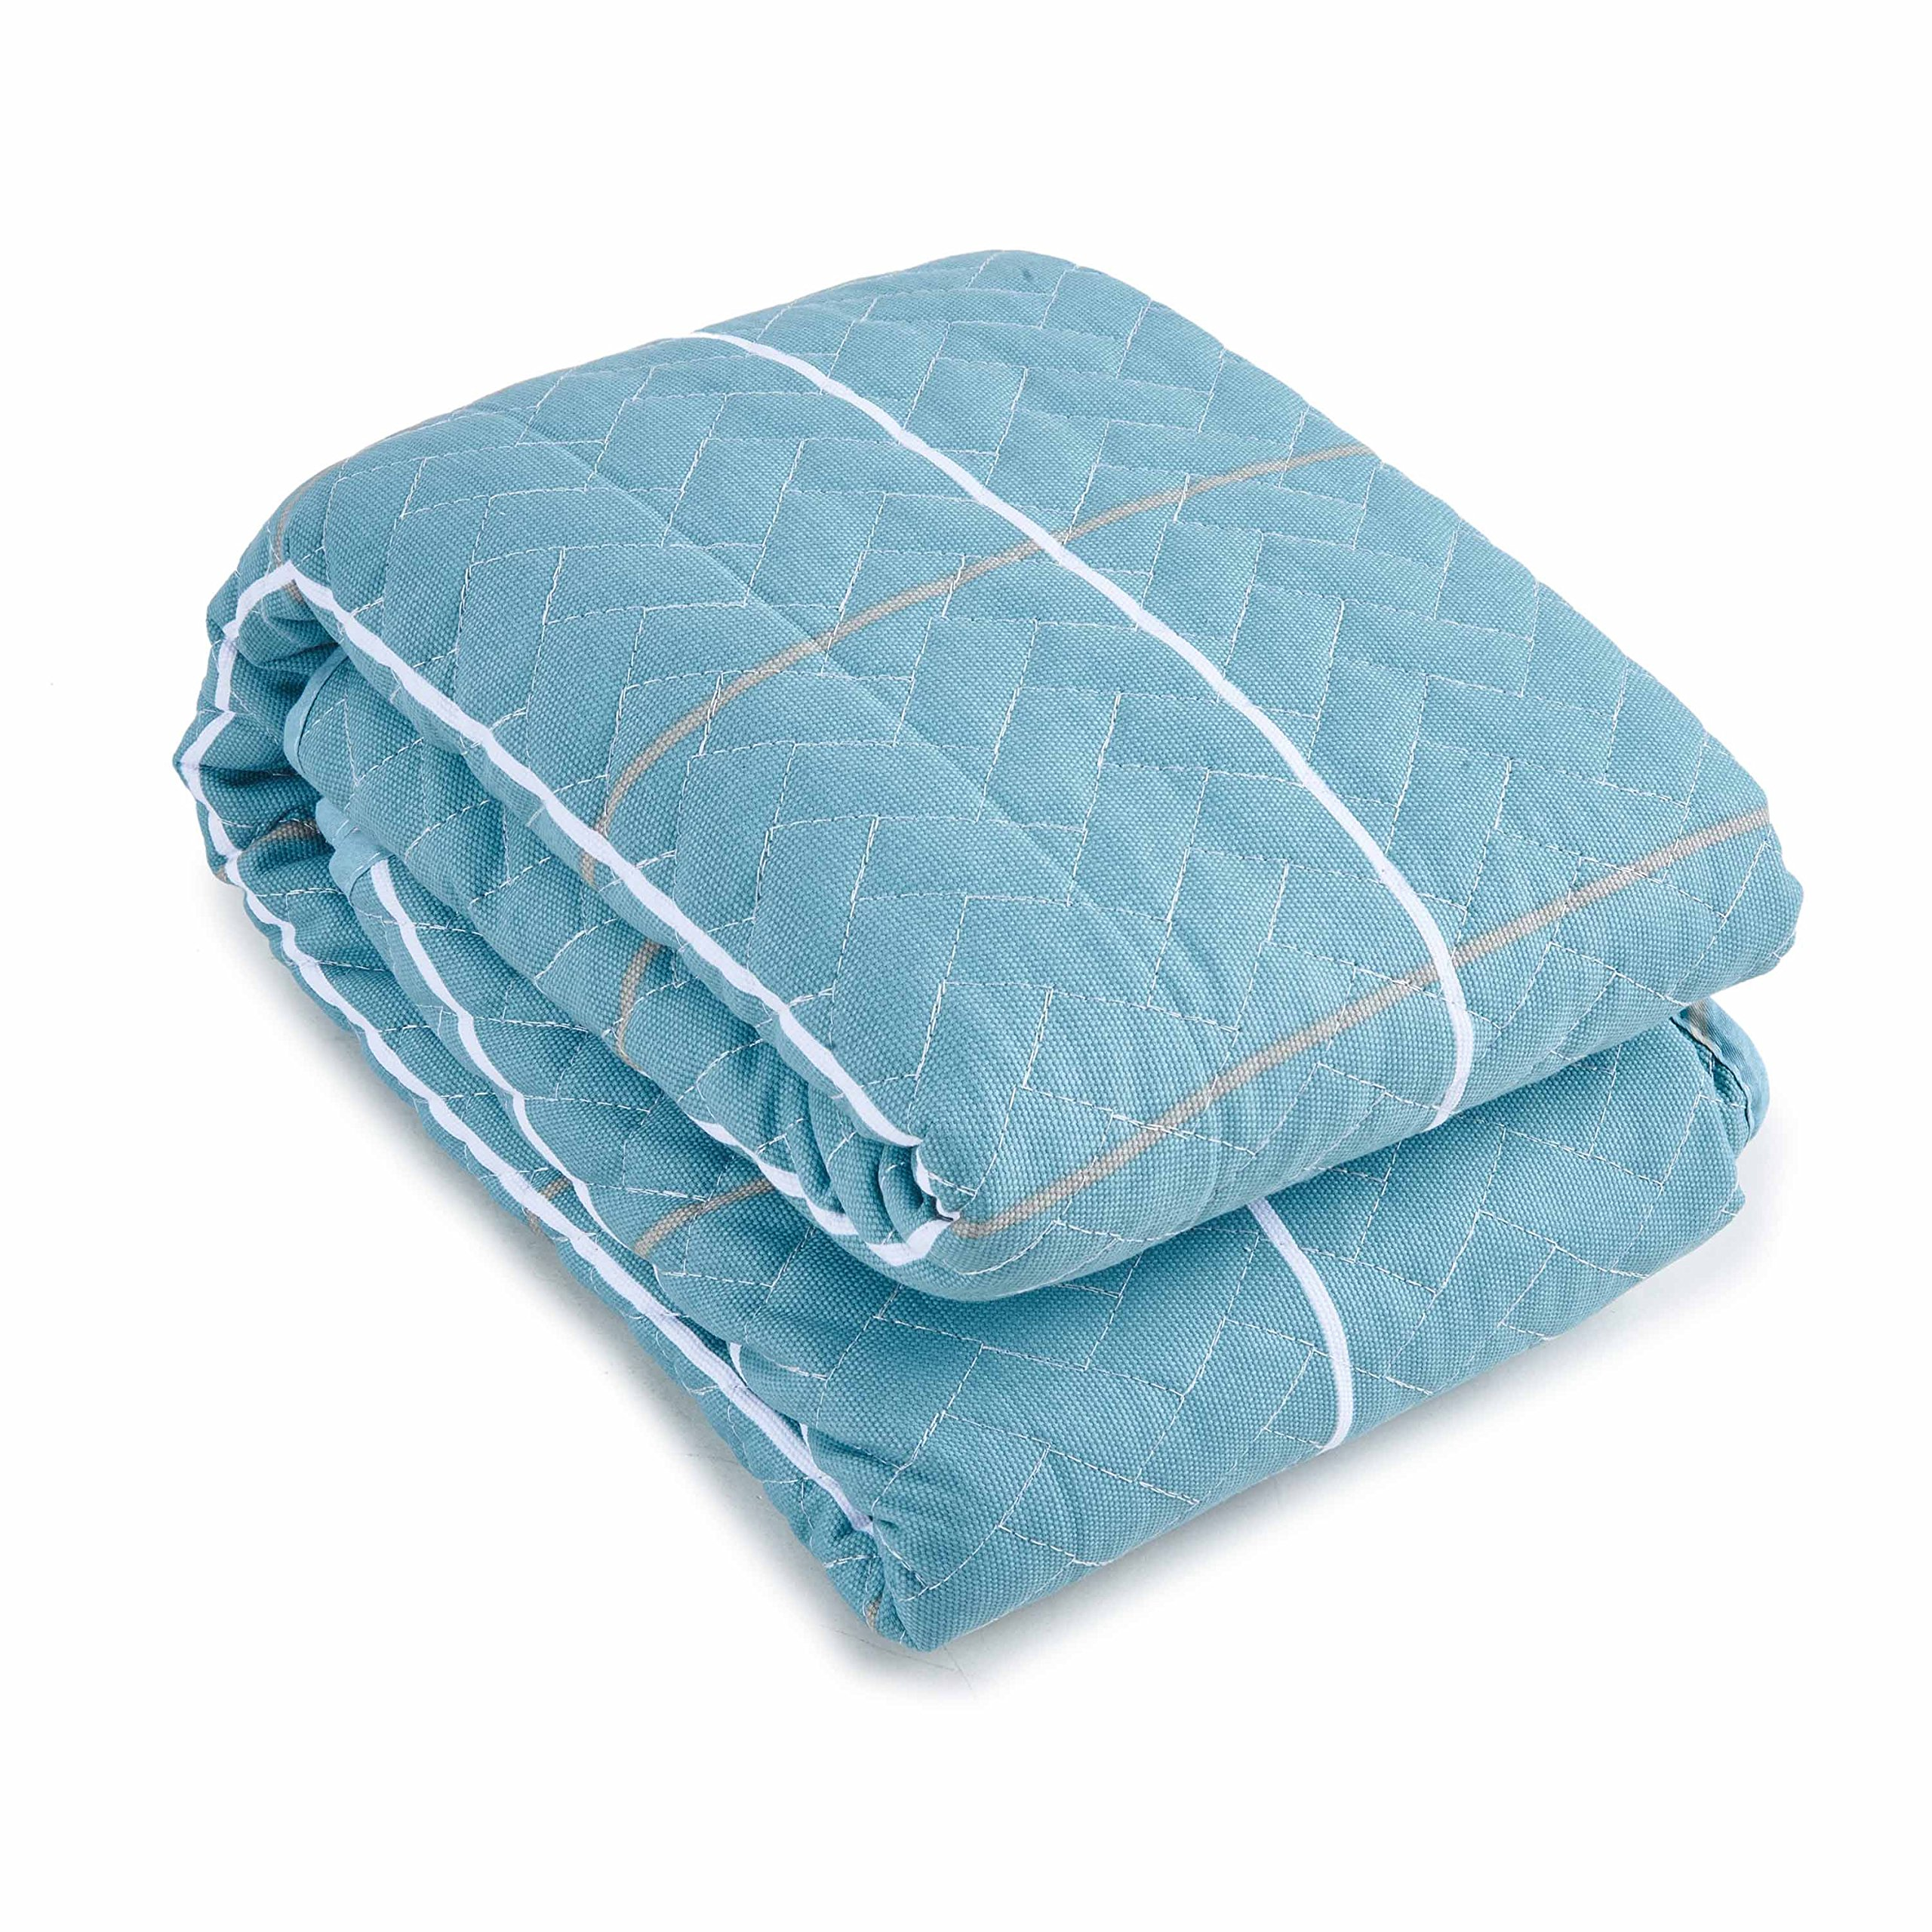 Cotton Non-Slip Sofa Seats Mat Cover Pad Furniture Protectors With Multi (Lake Blue, 36\